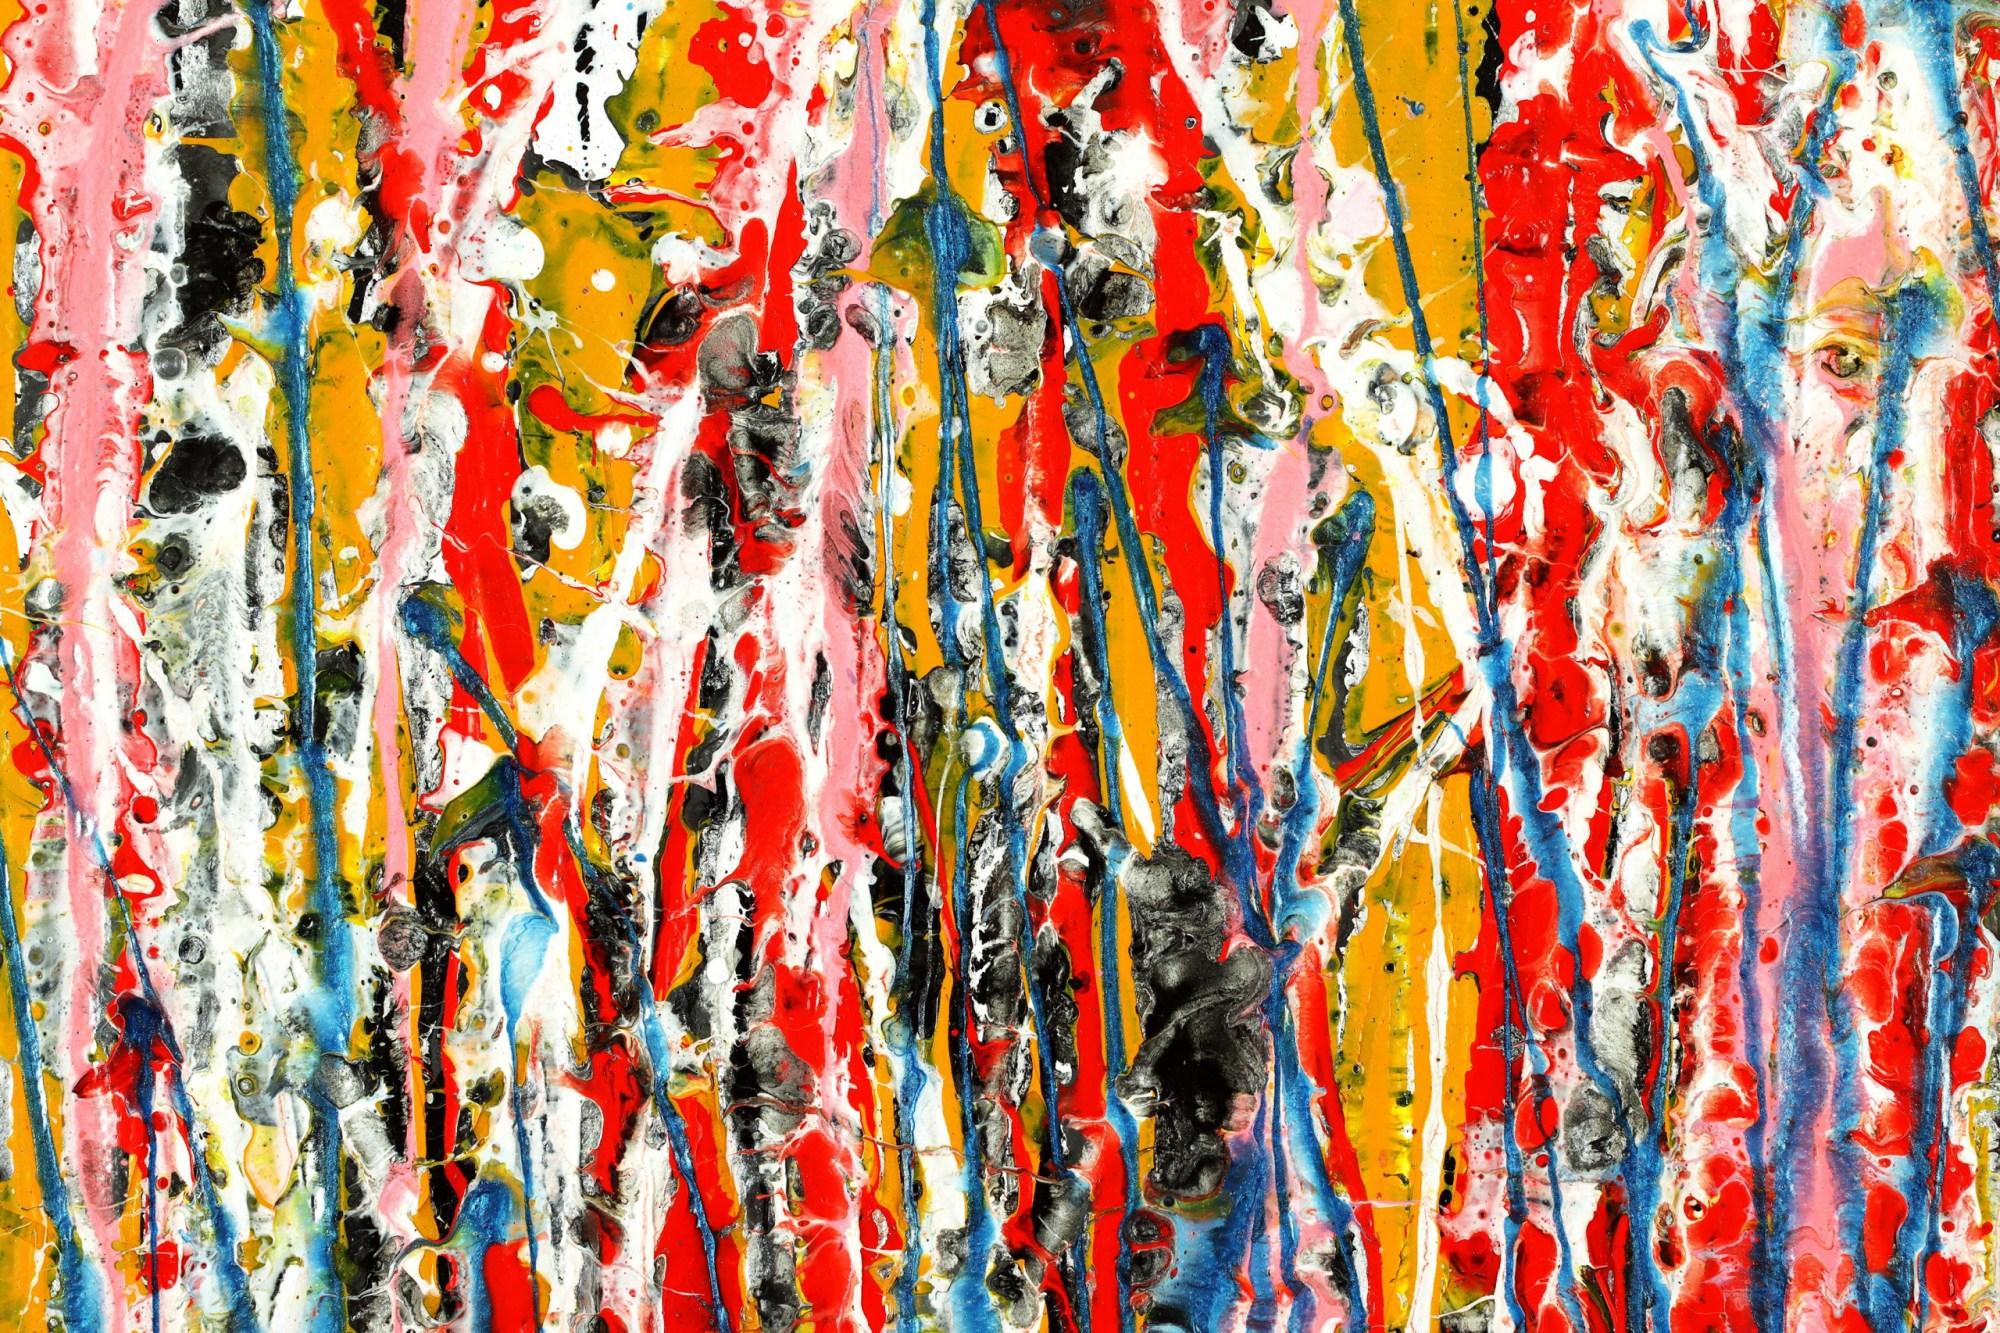 Dream Sequence 1 (2021) - DETAIL / Multi-canvas work by Nestor Toro